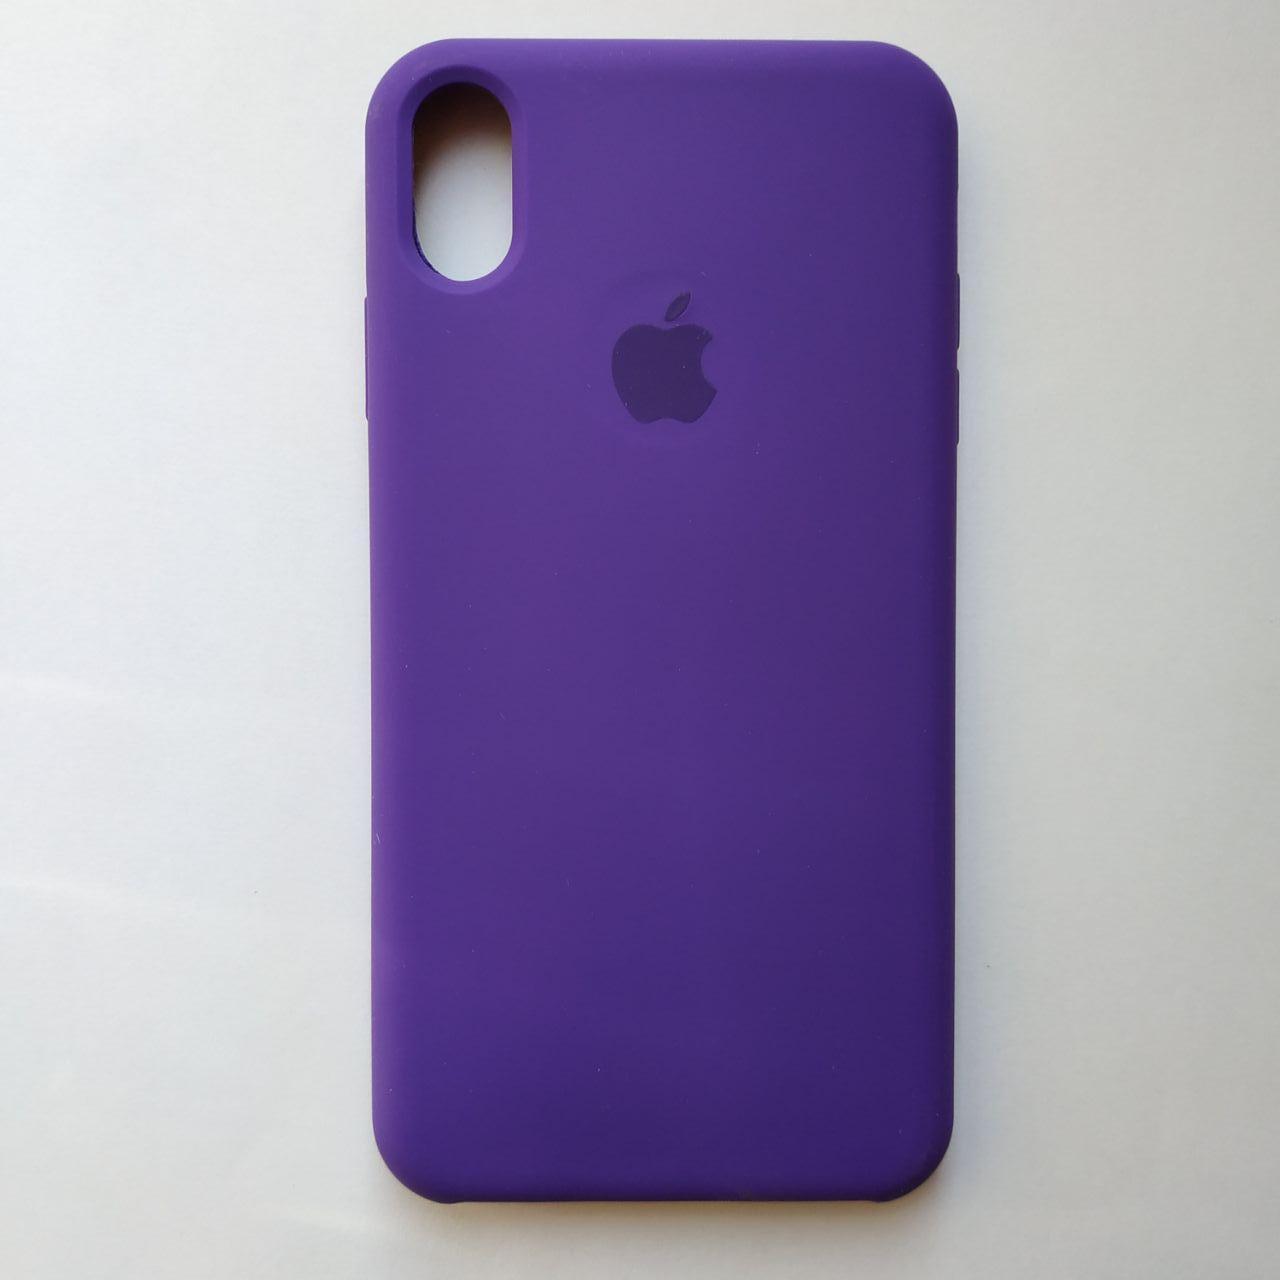 Чехол-накладка Silicone Case для Apple iPhone XS Max Ultra Violet